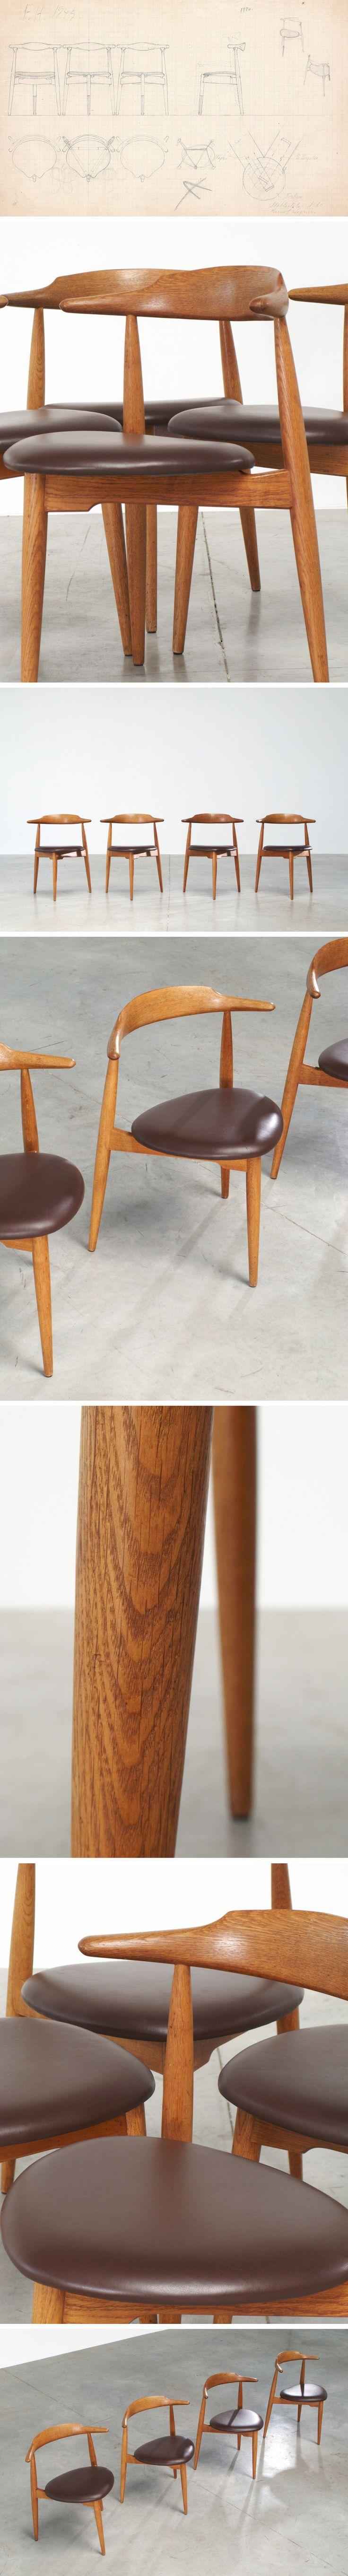 Hans Wegner set of four Heart chairs 4103 Fritz Hansen 1952 Large